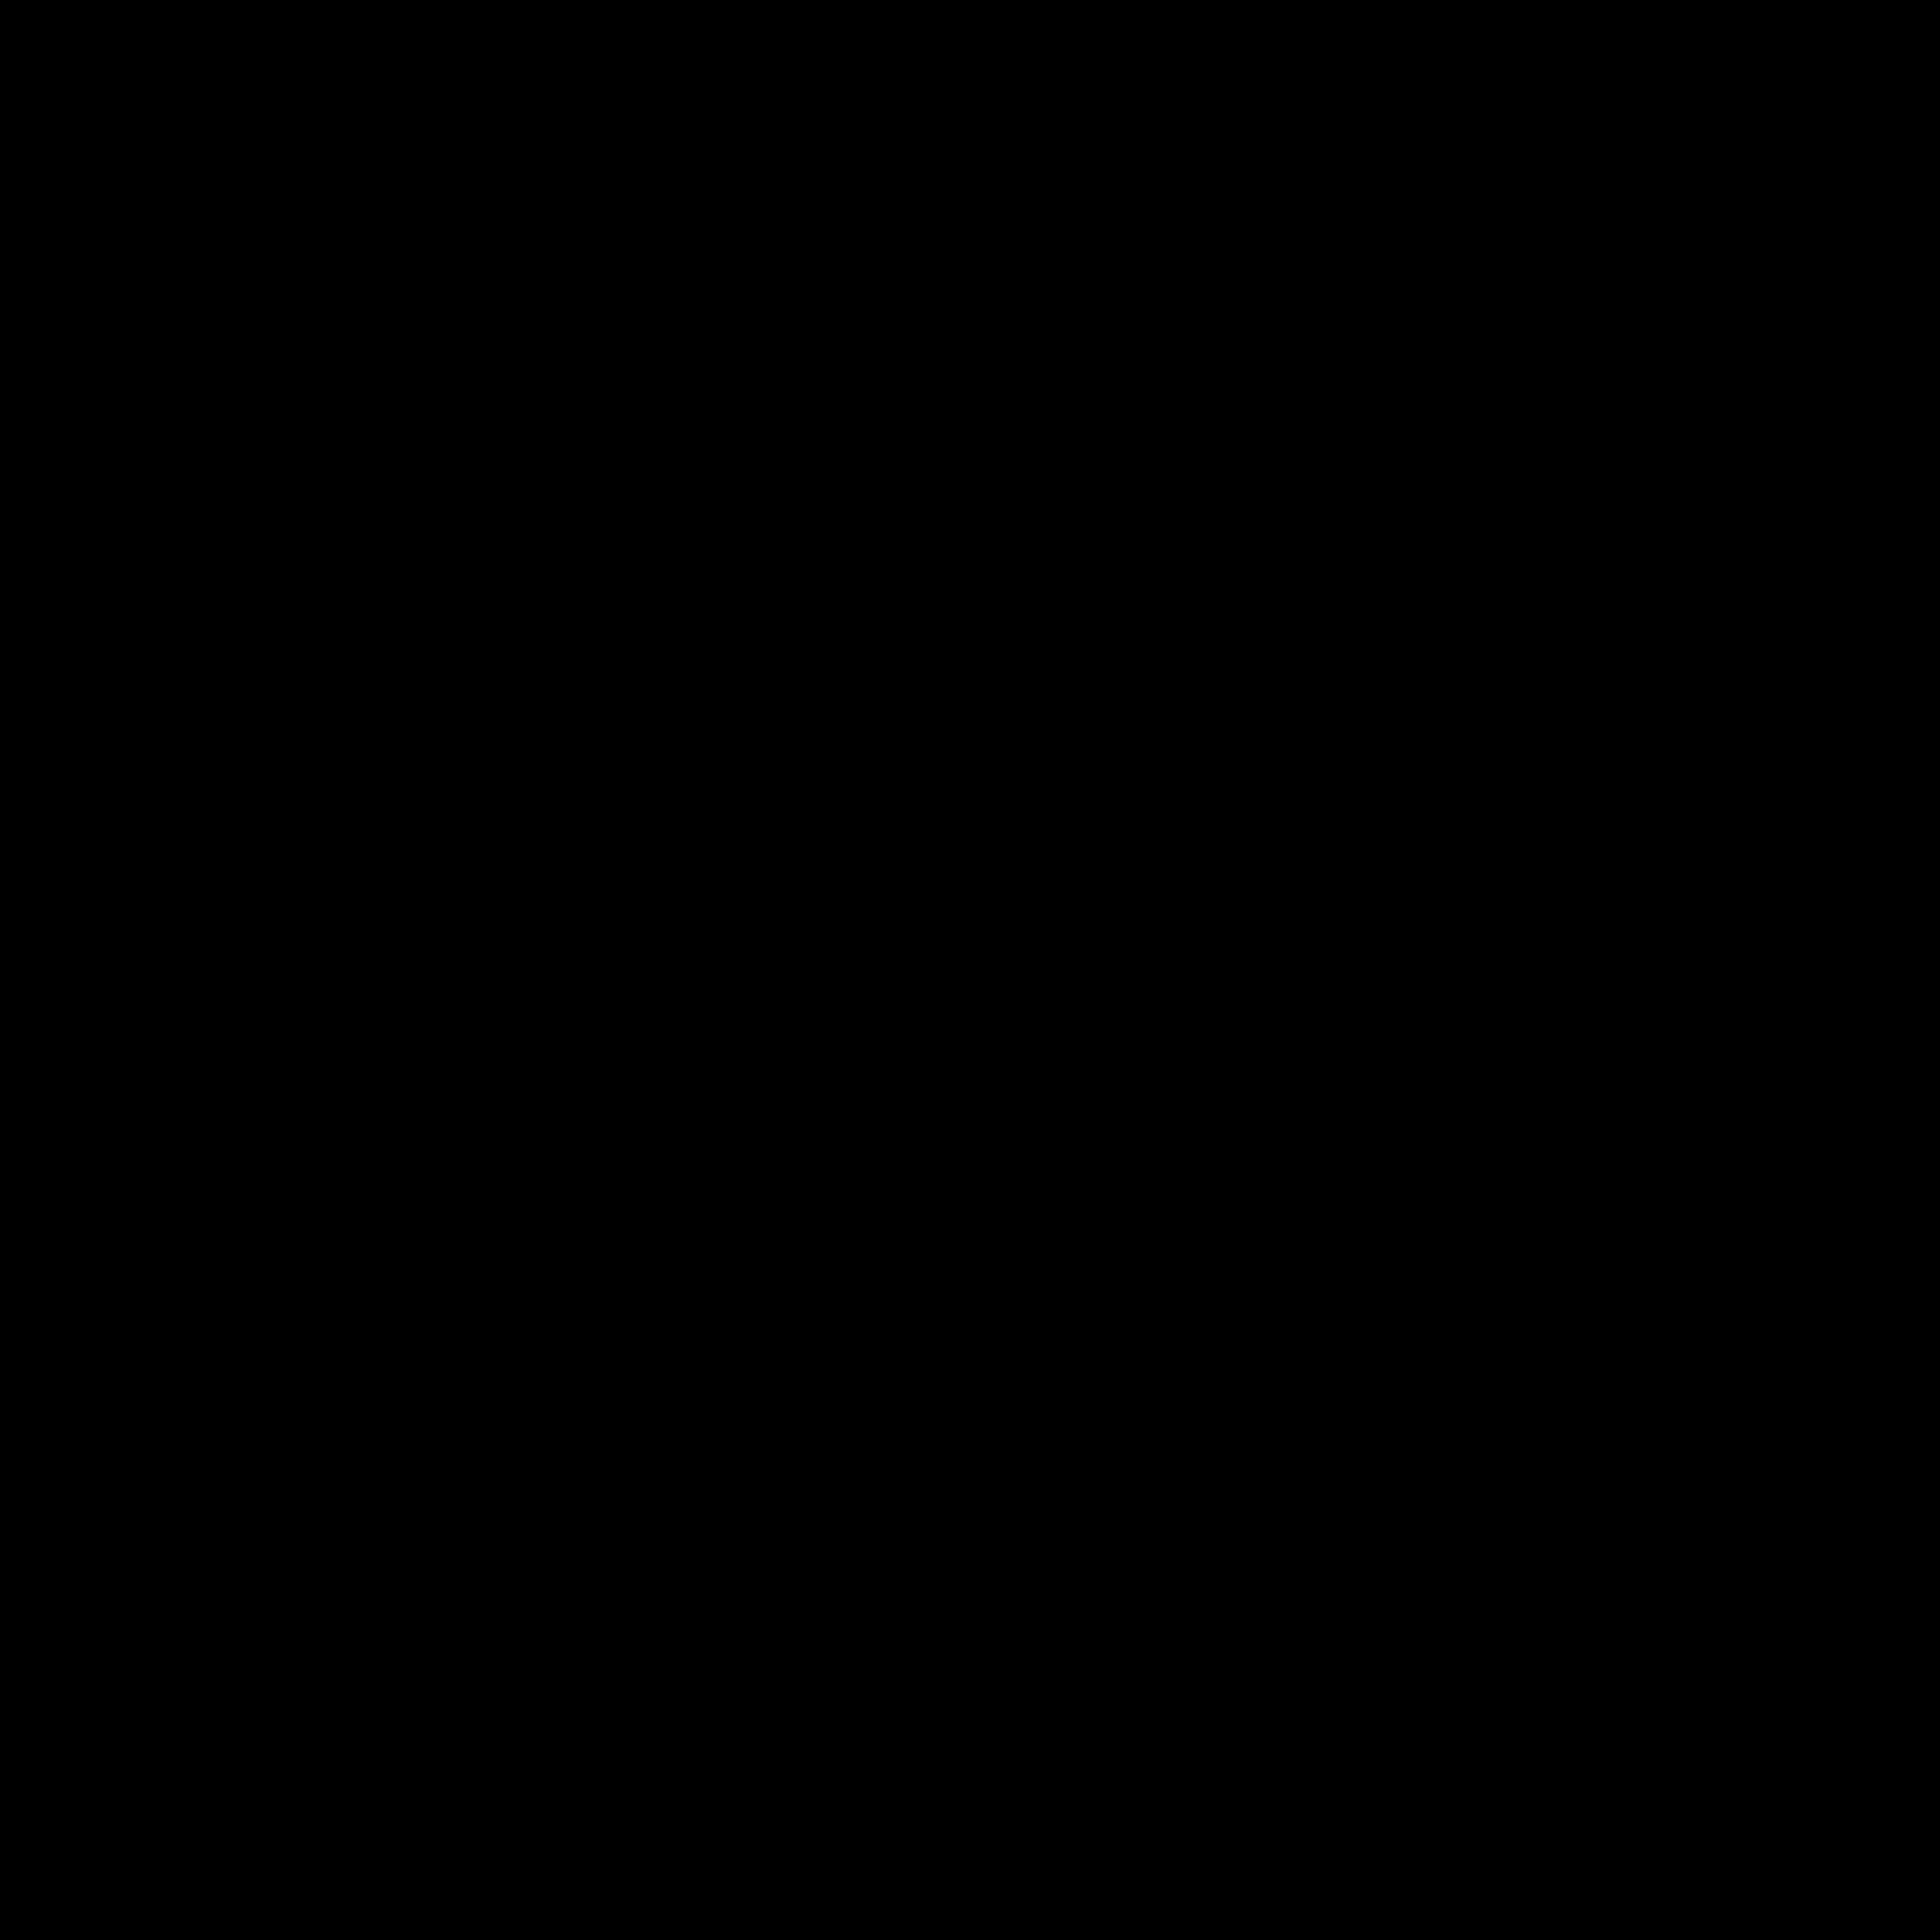 Farberware High Performance Nonstick Aluminum 11-Inch Square Griddle, Black by Farberware (Image #2)